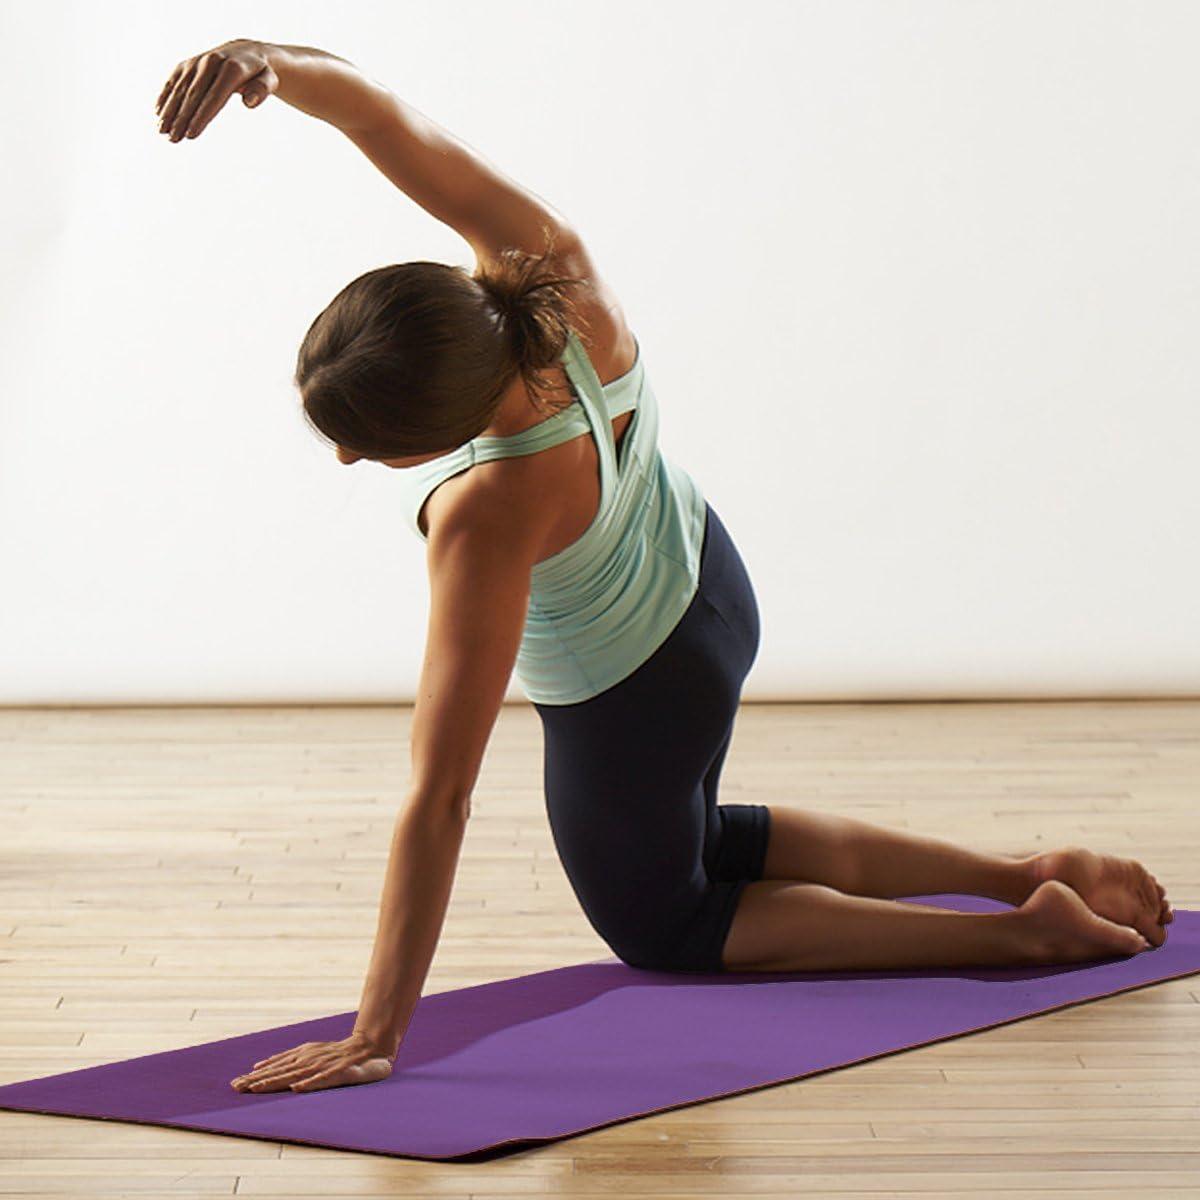 Amazon.com: STOTT PILATES - Esterilla para pilates: Sports ...